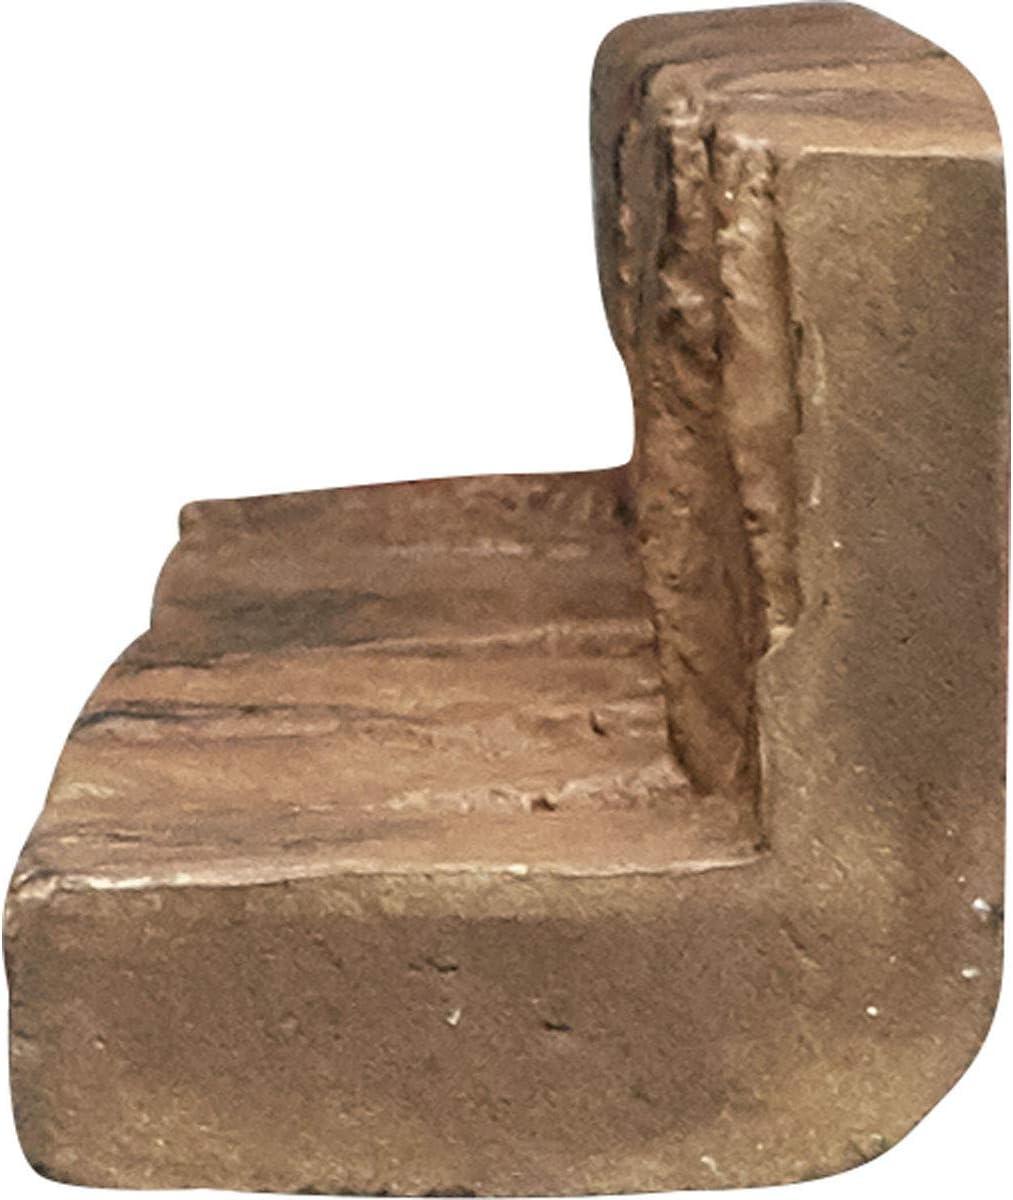 Ekena Millwork PNUIC03X48CO Universal Inside Corner Stacked Stone Stonewall Faux Stone Siding Panel 3W x 3D x 48H Colfax 1 EA